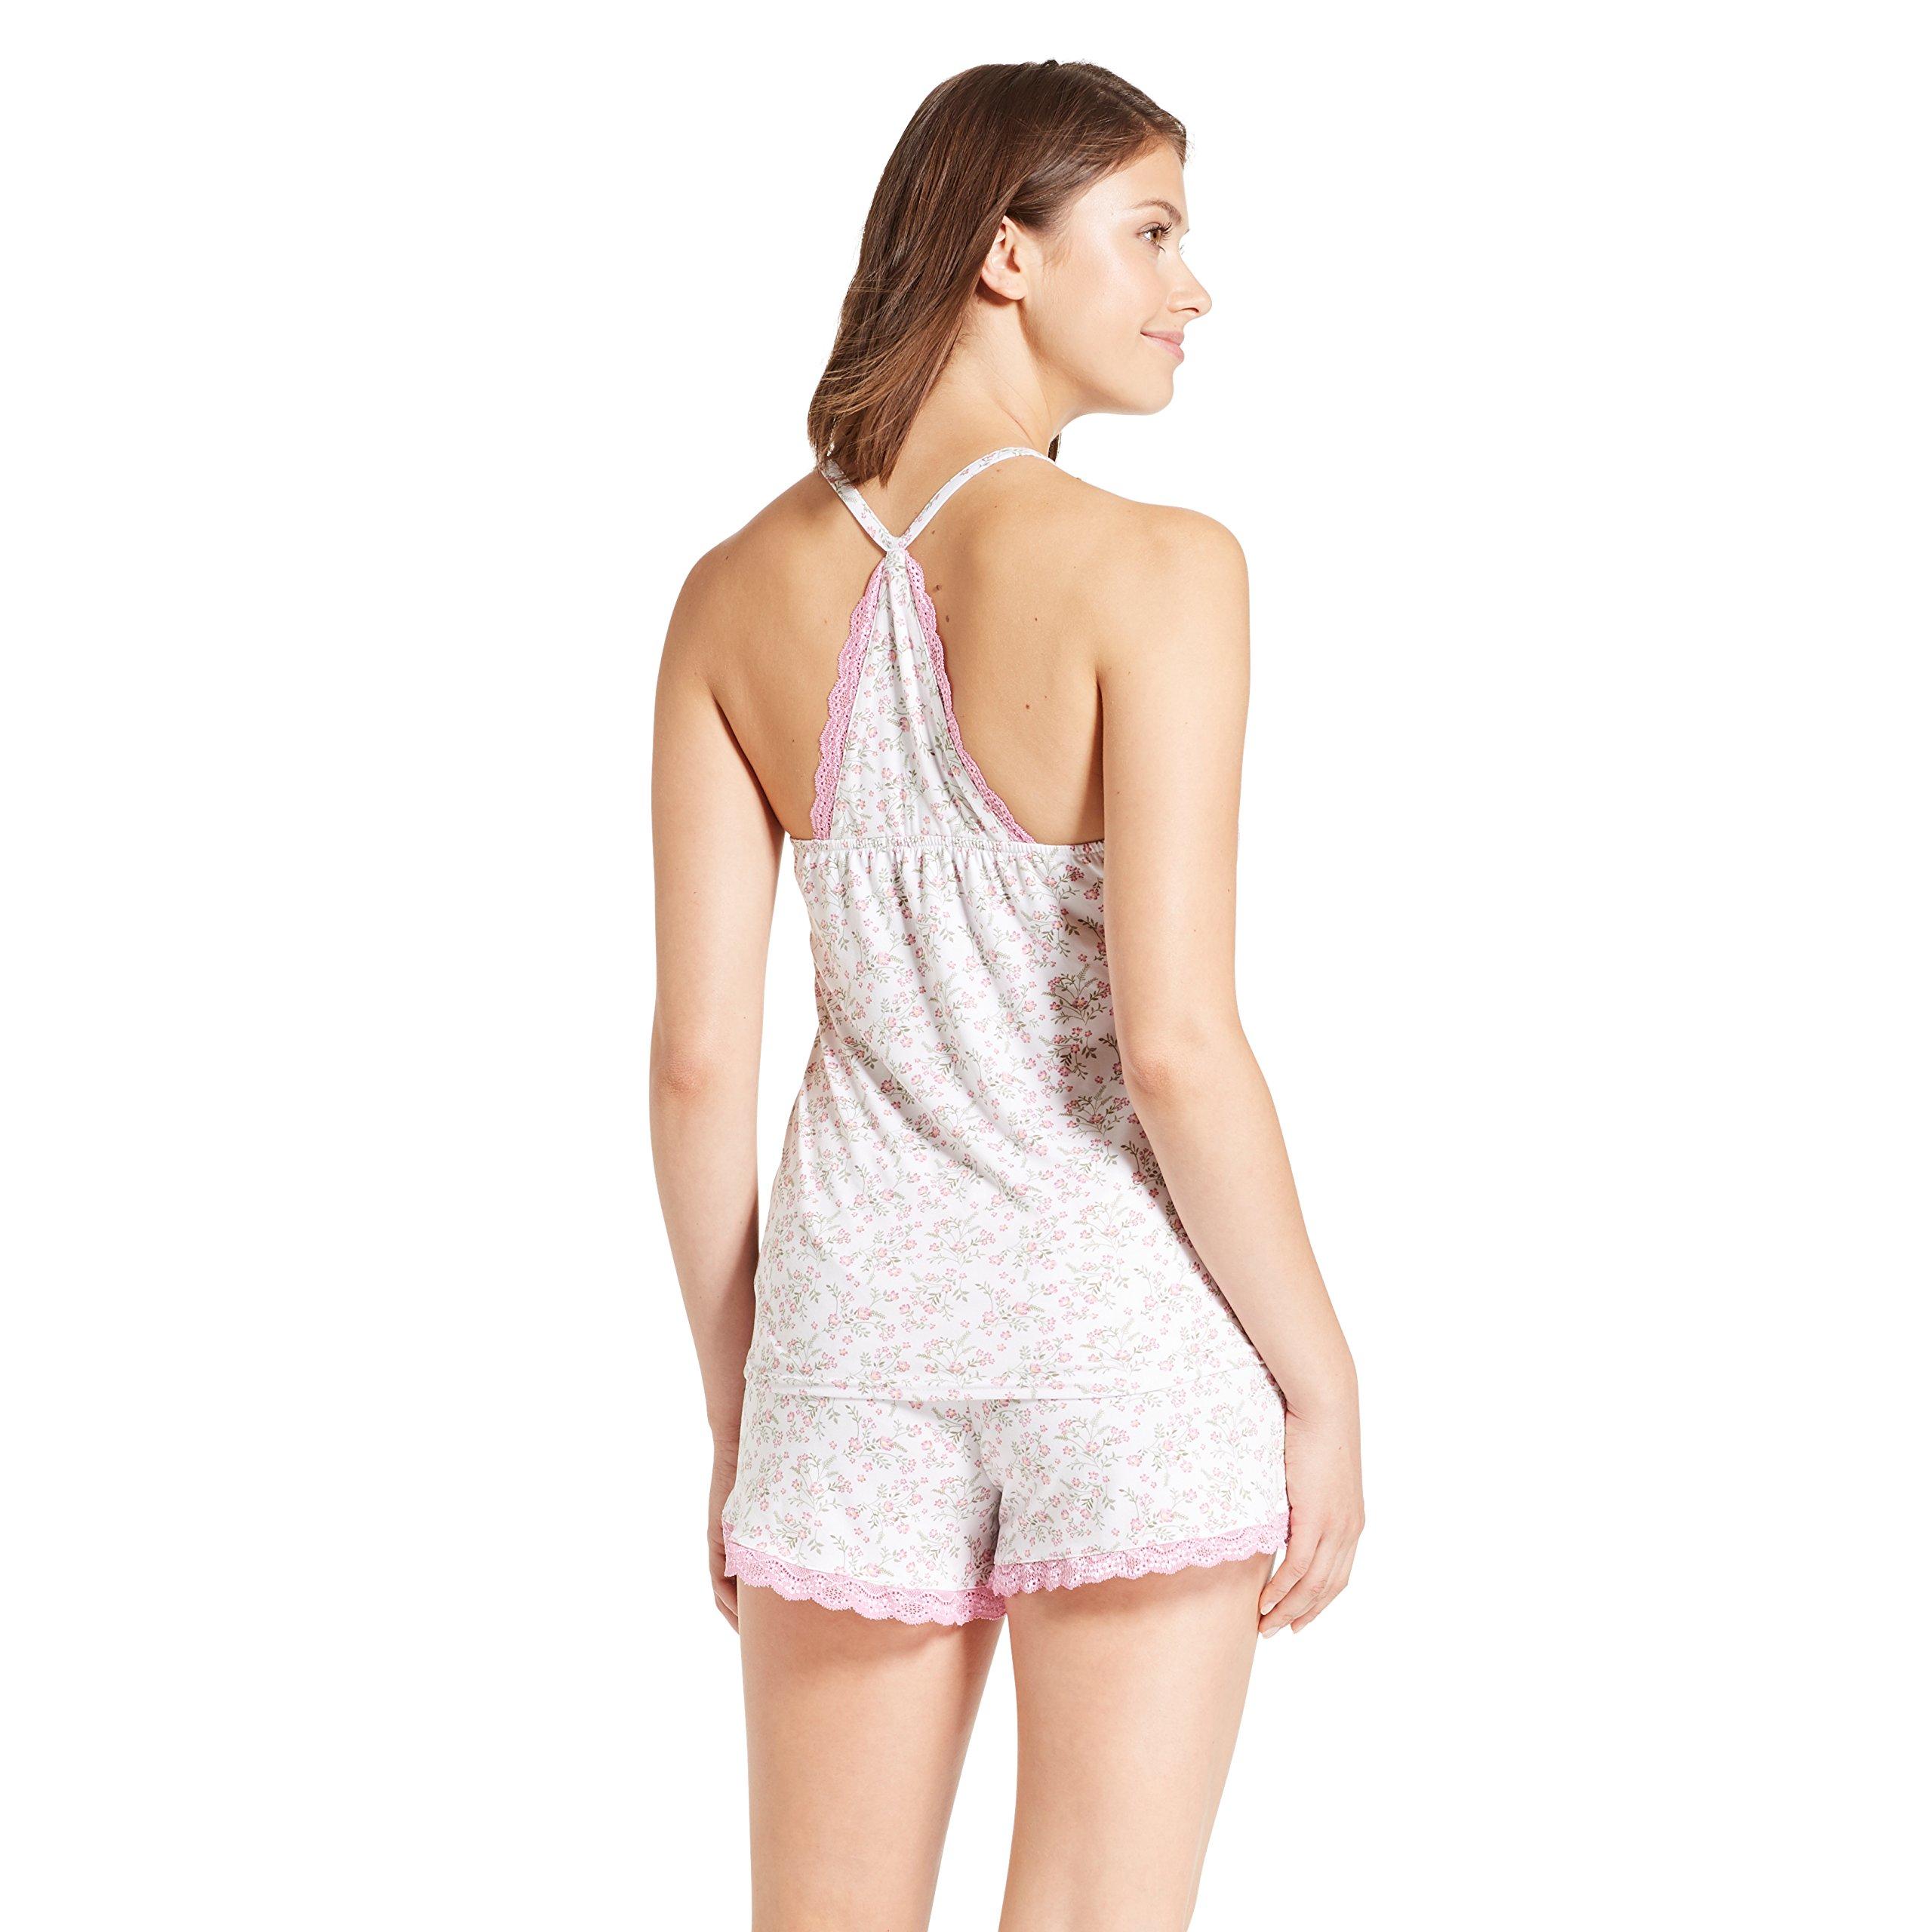 Nanette Nanette Lepore Womens Racerback Shirt Elastic Waist Shorts Pajama Set Spring White Large by Nanette Lepore (Image #2)